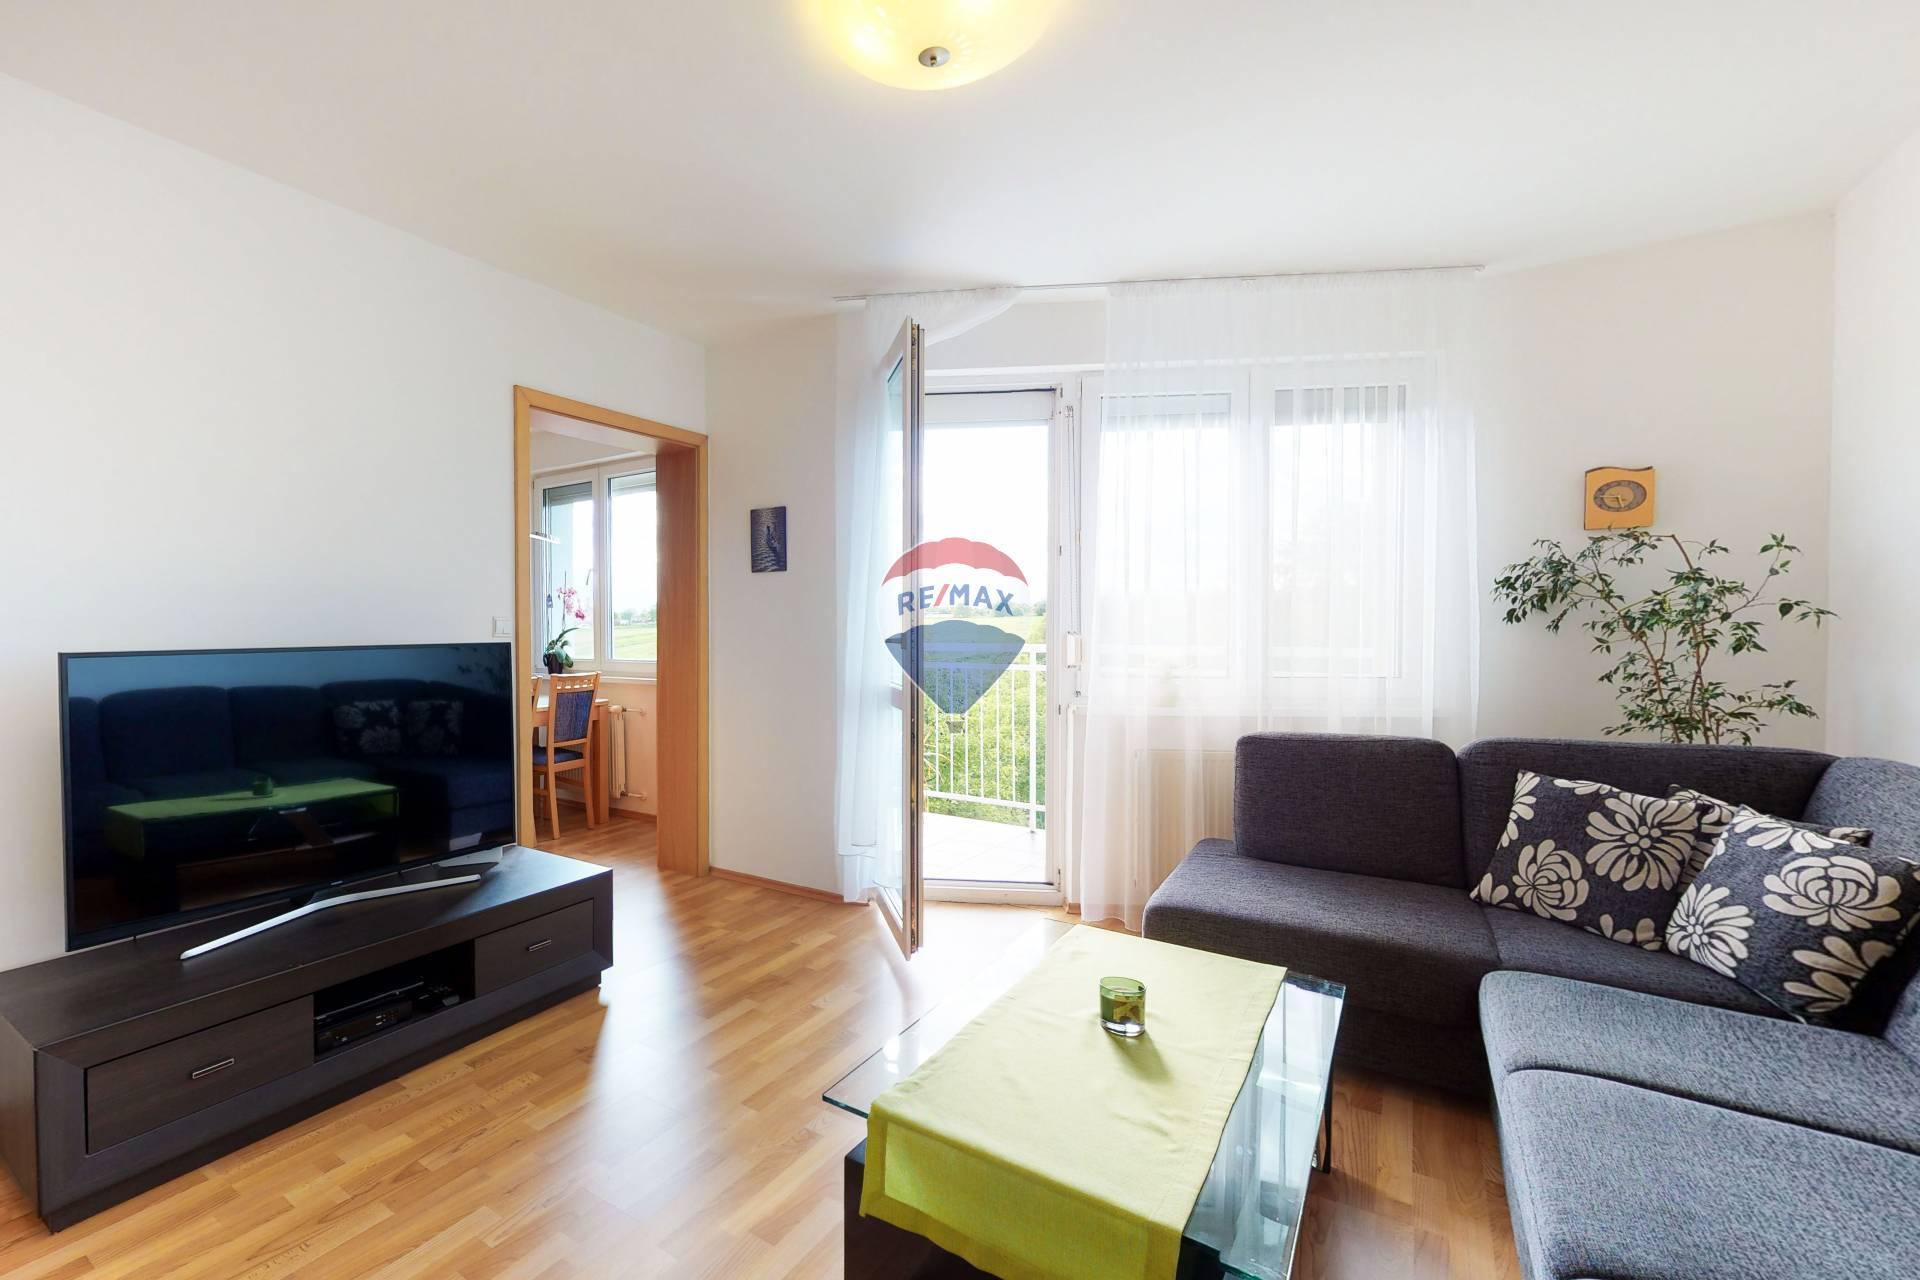 3D VIDEO: PREDAJ 4 izb. bytu, J. Farkaša, Senec, 2 balkóny, vlastné kúrenie